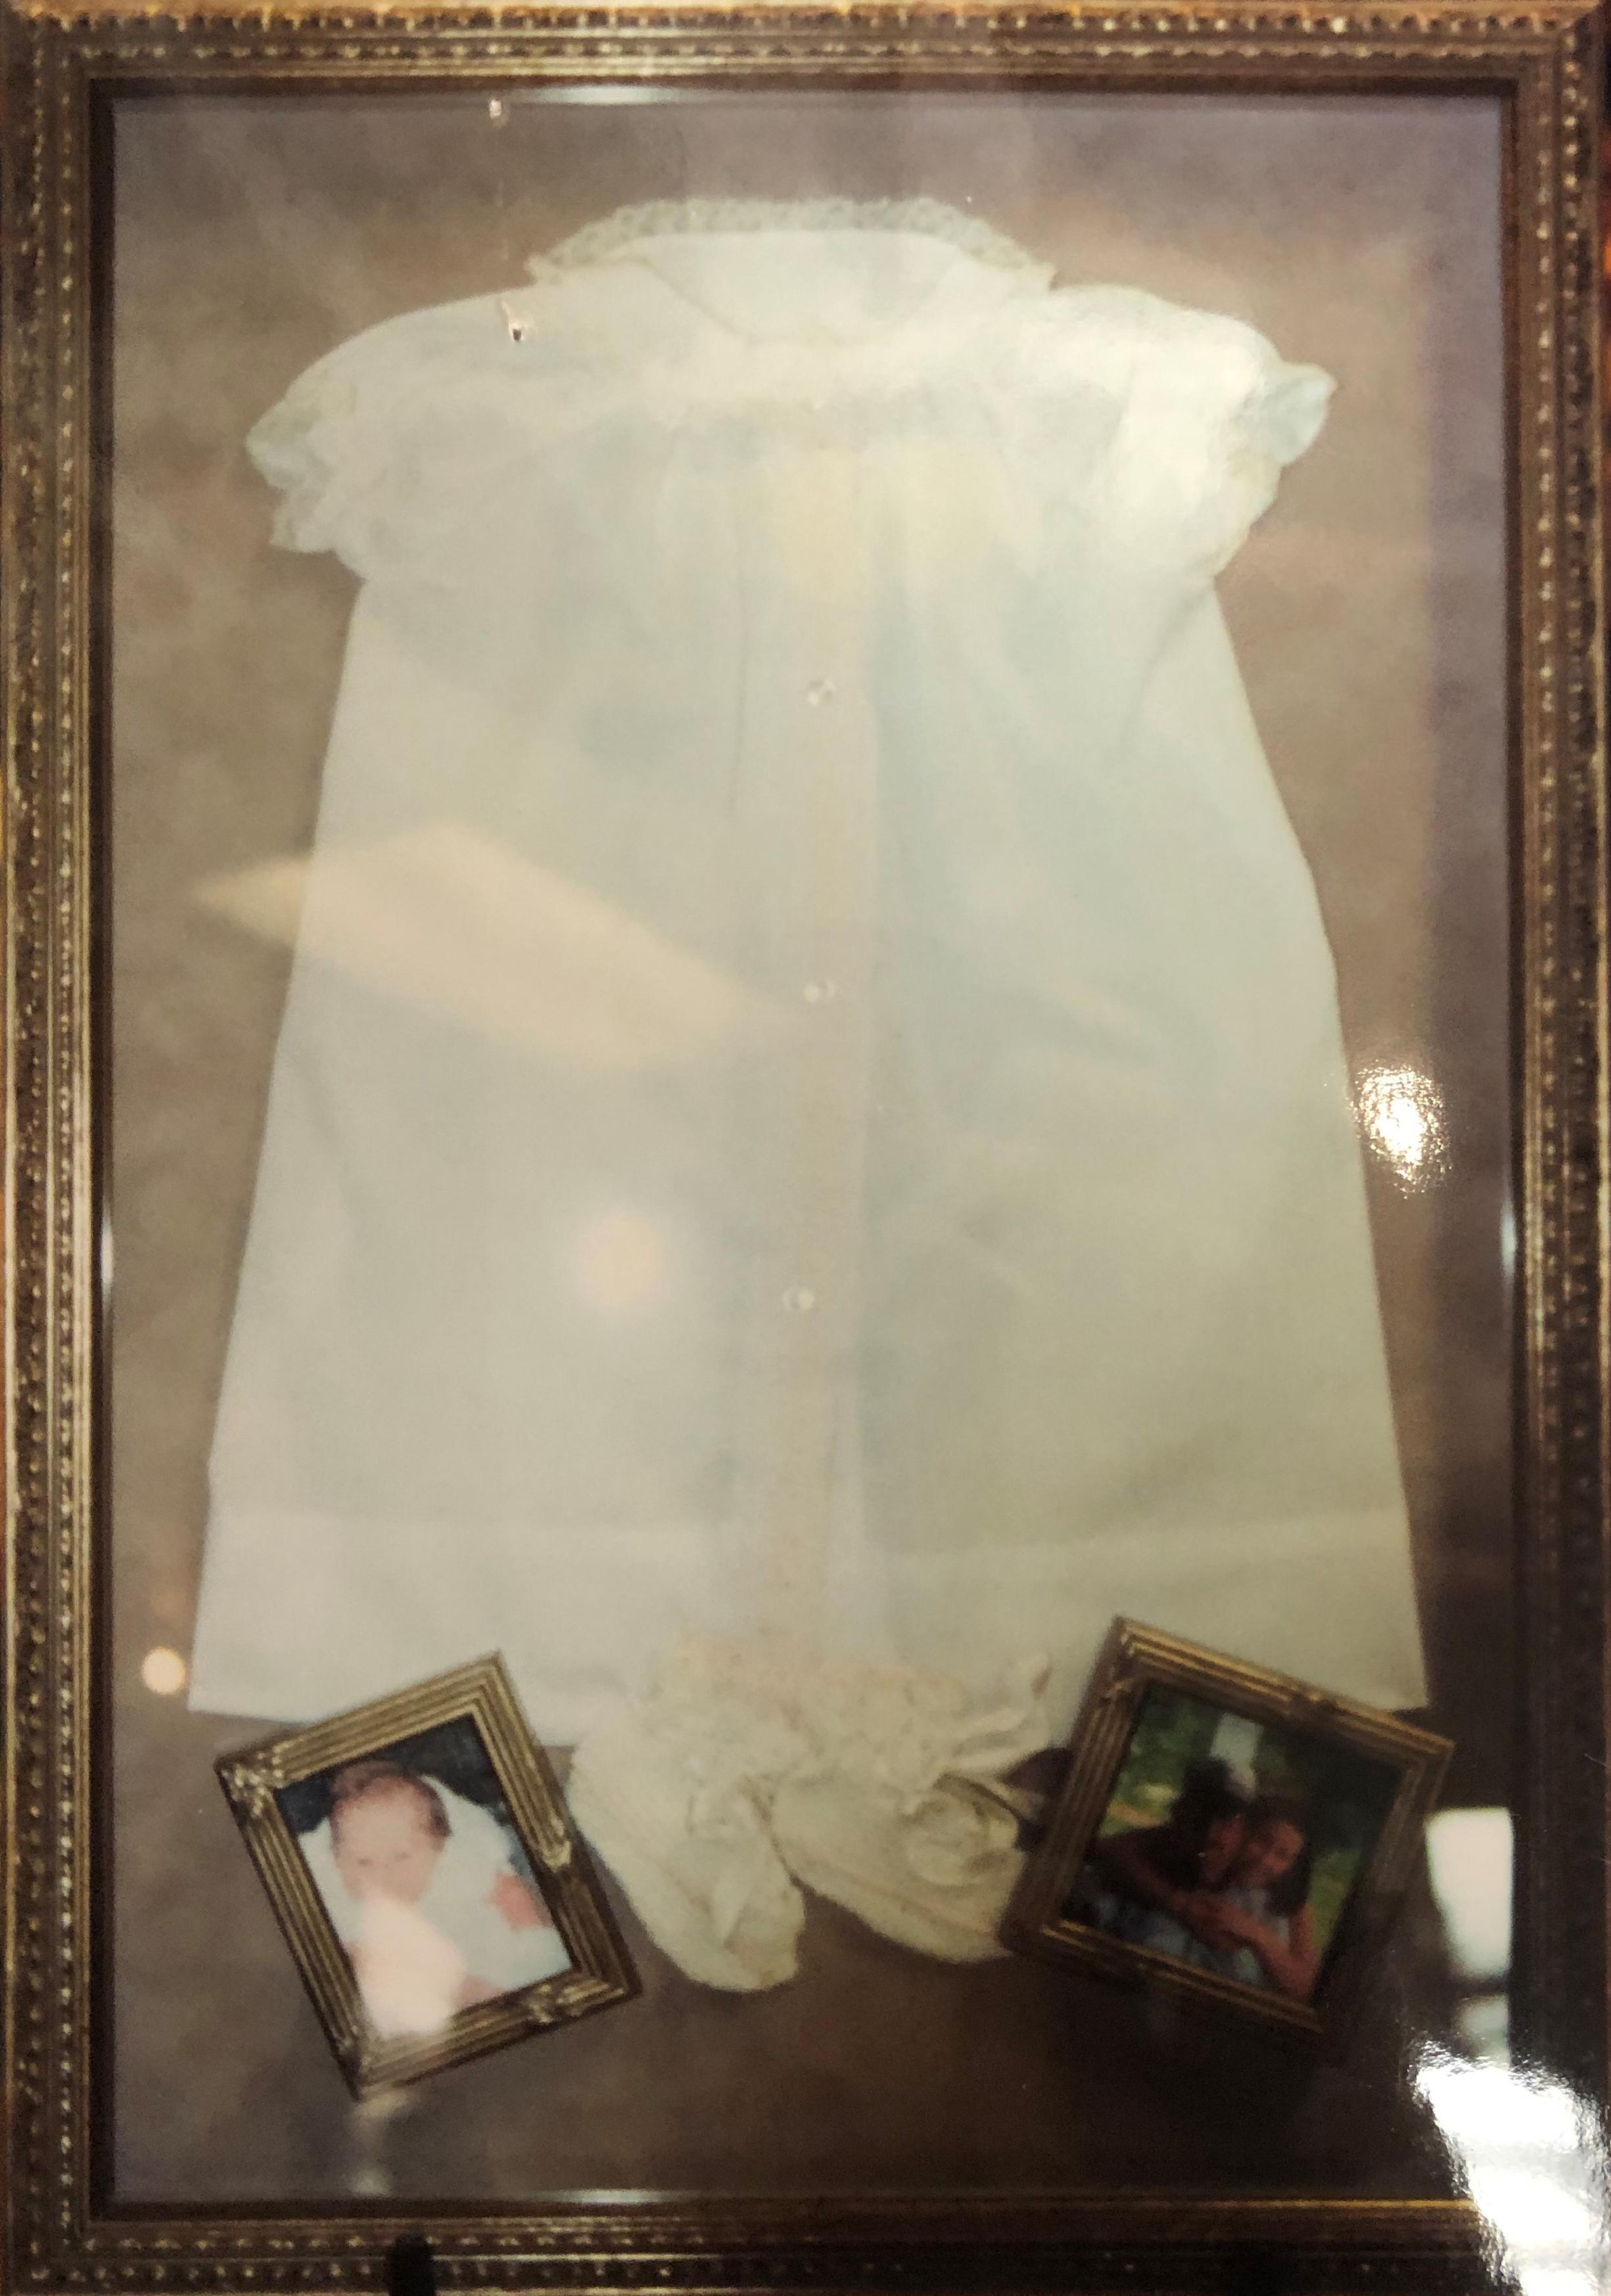 4-christening-gown2.jpg